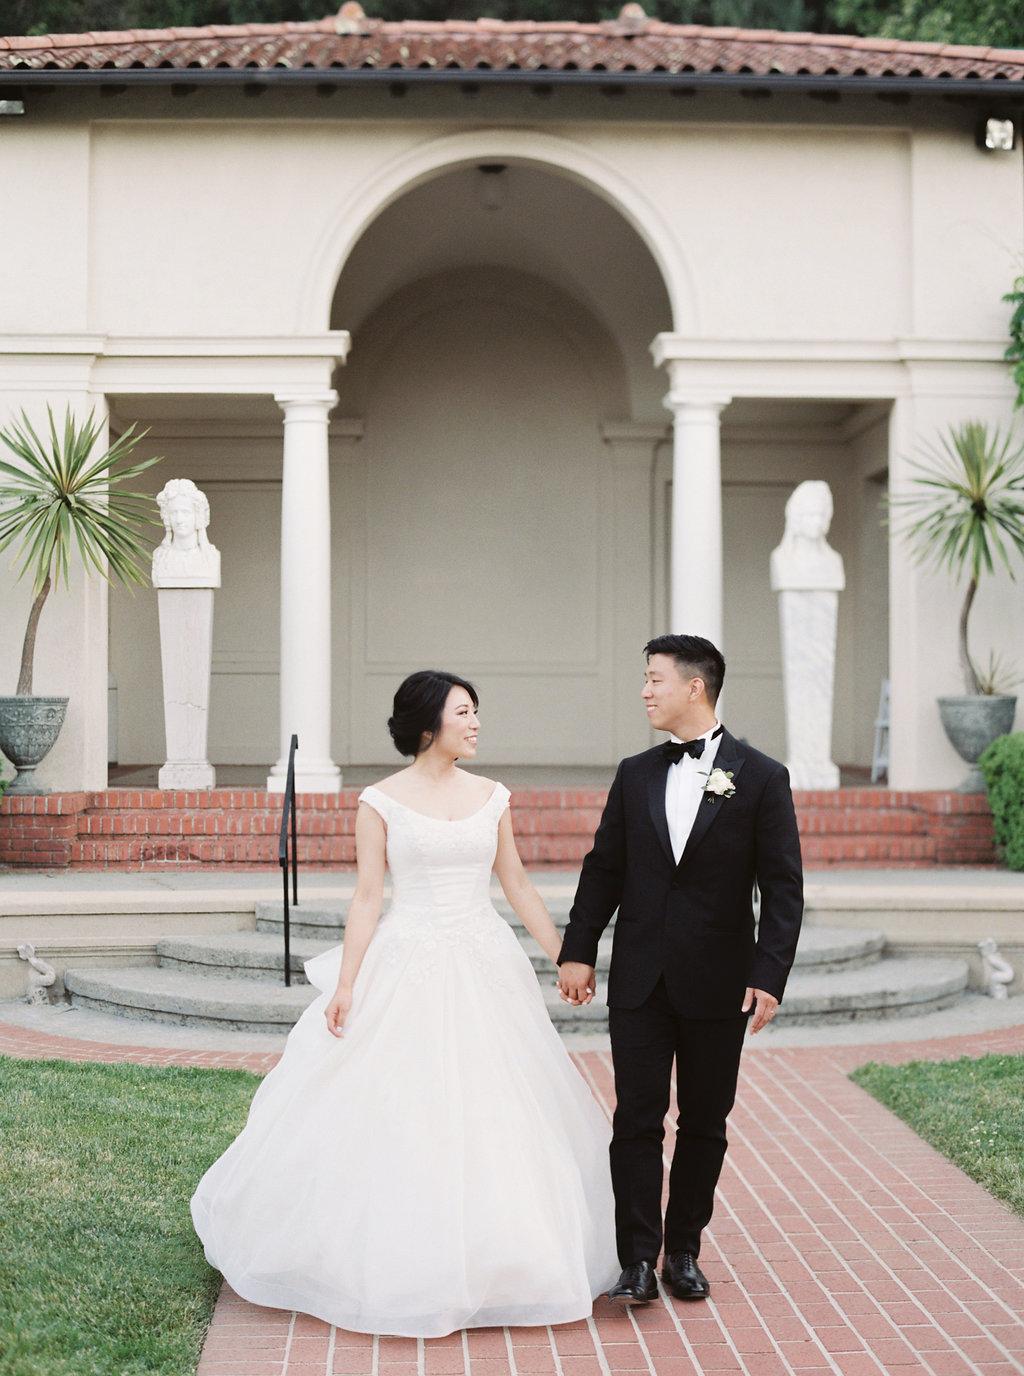 Villa Montalvo Saratoga Film Photographer Wedding